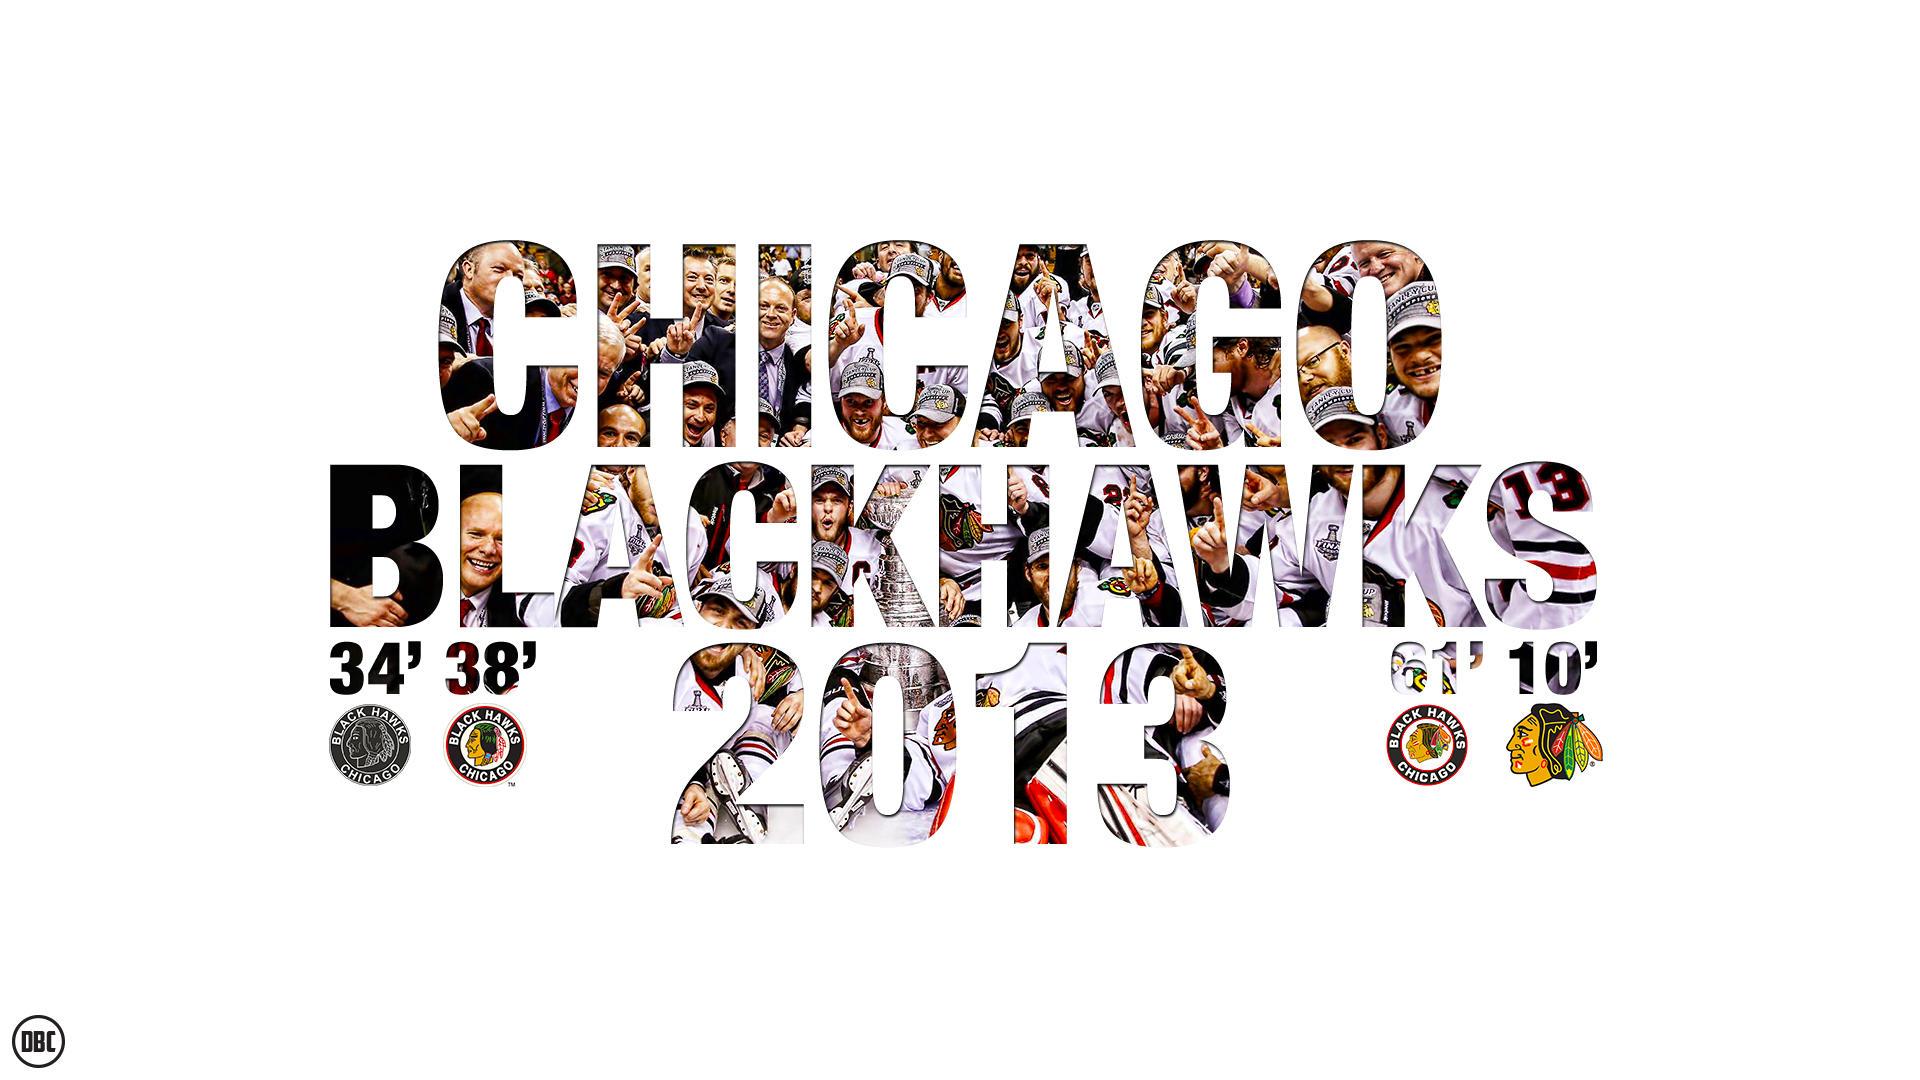 Chicago Black Hawks 2013 Champions Wallpaper by Chadski51